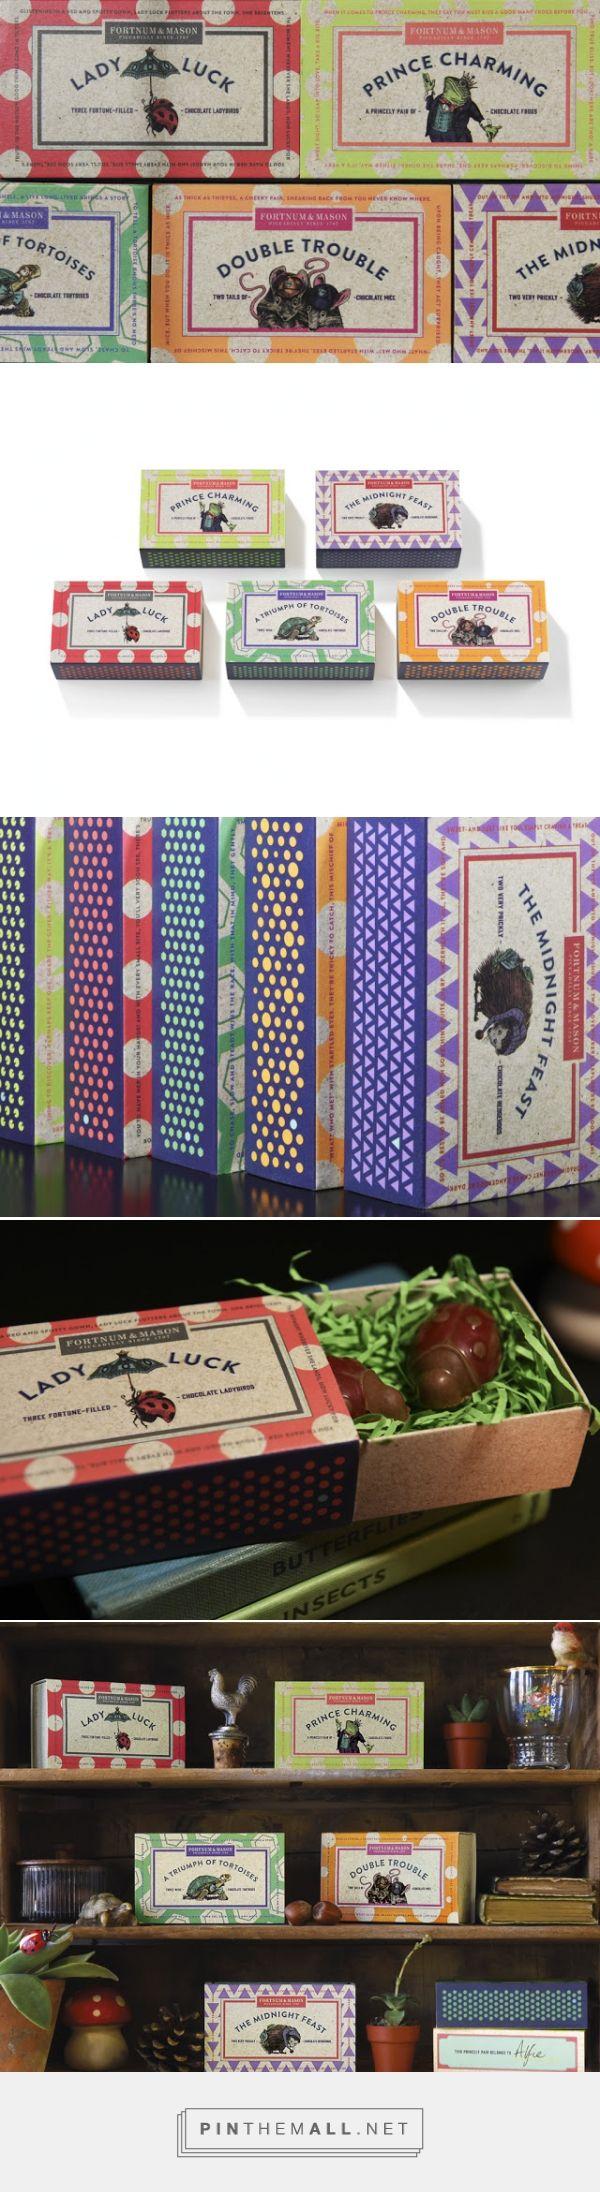 """Tales from an English Country Garden: Design Bridge and Fortnum & Mason create fun new chocolate range"